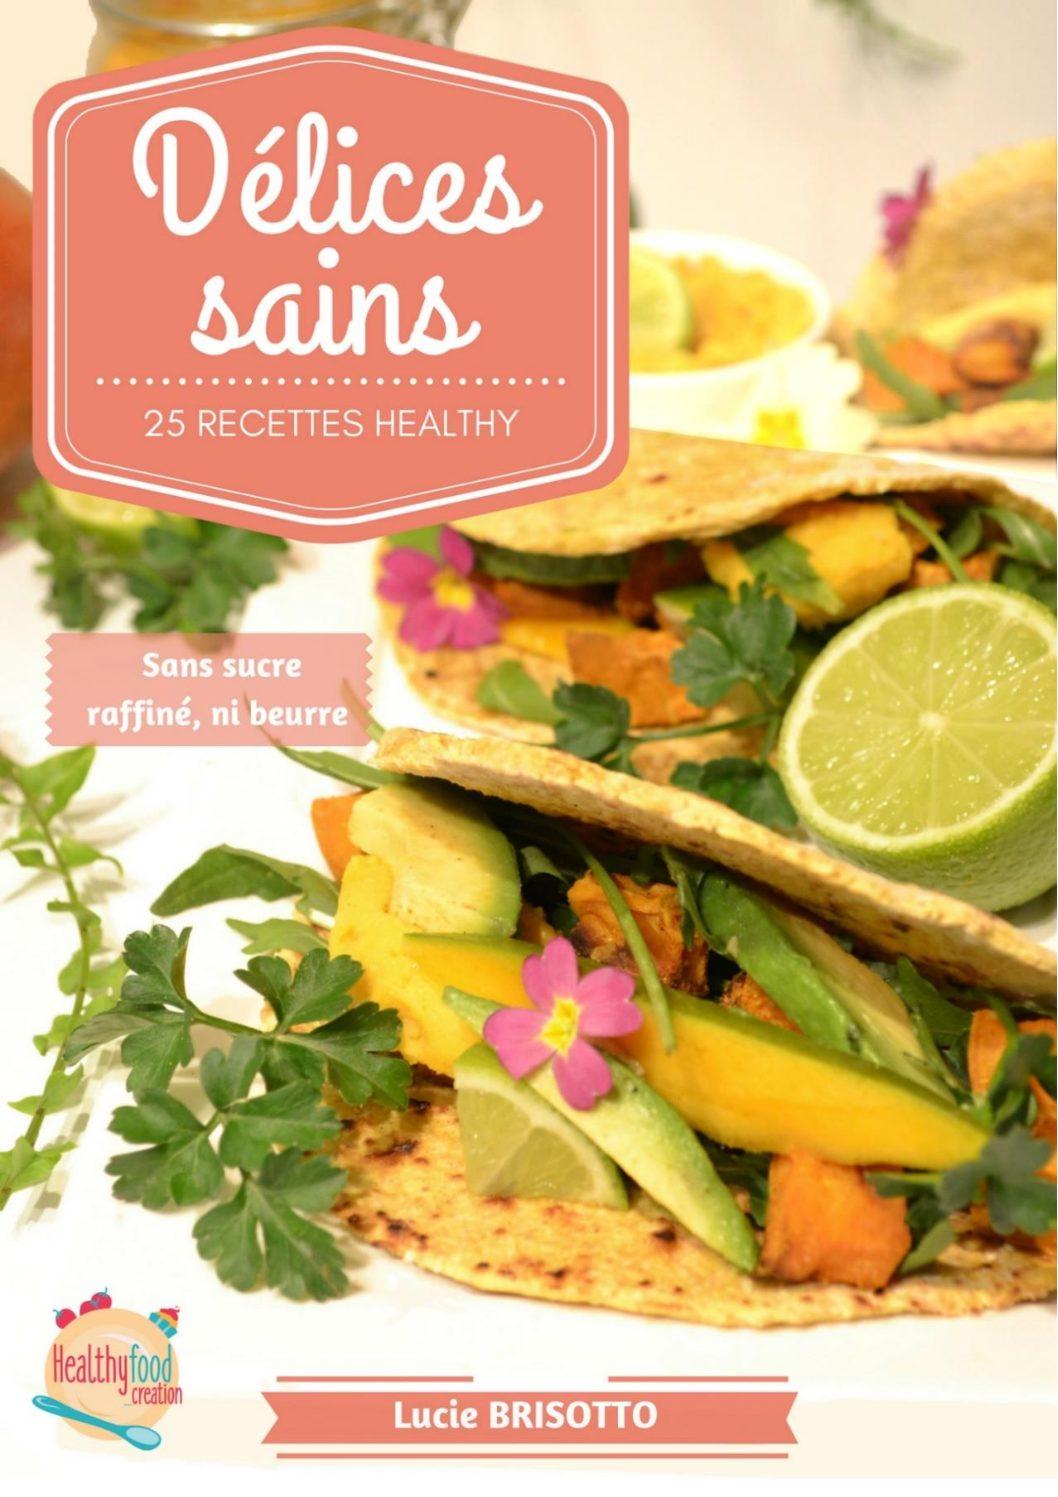 DELICES SAINS \u2013 25 recettes healthy inédites